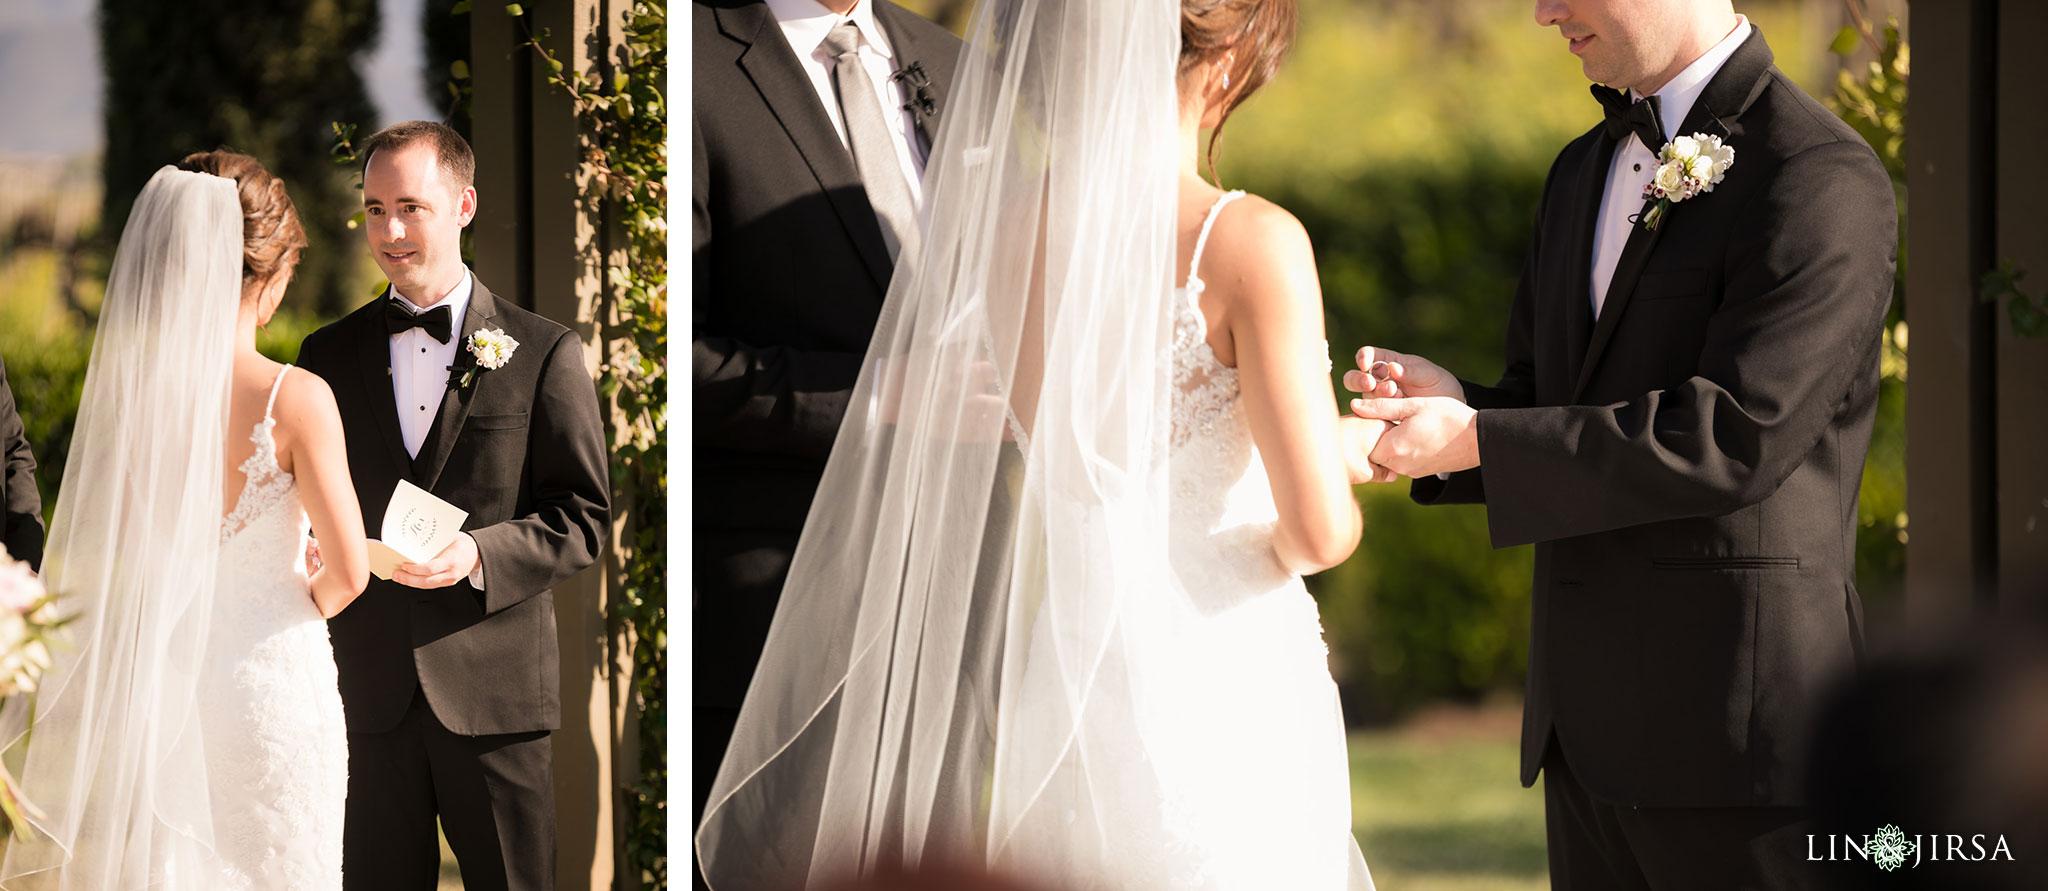 20 Ponte Winery Vineyard Garden Temecula Wedding Ceremony Photography